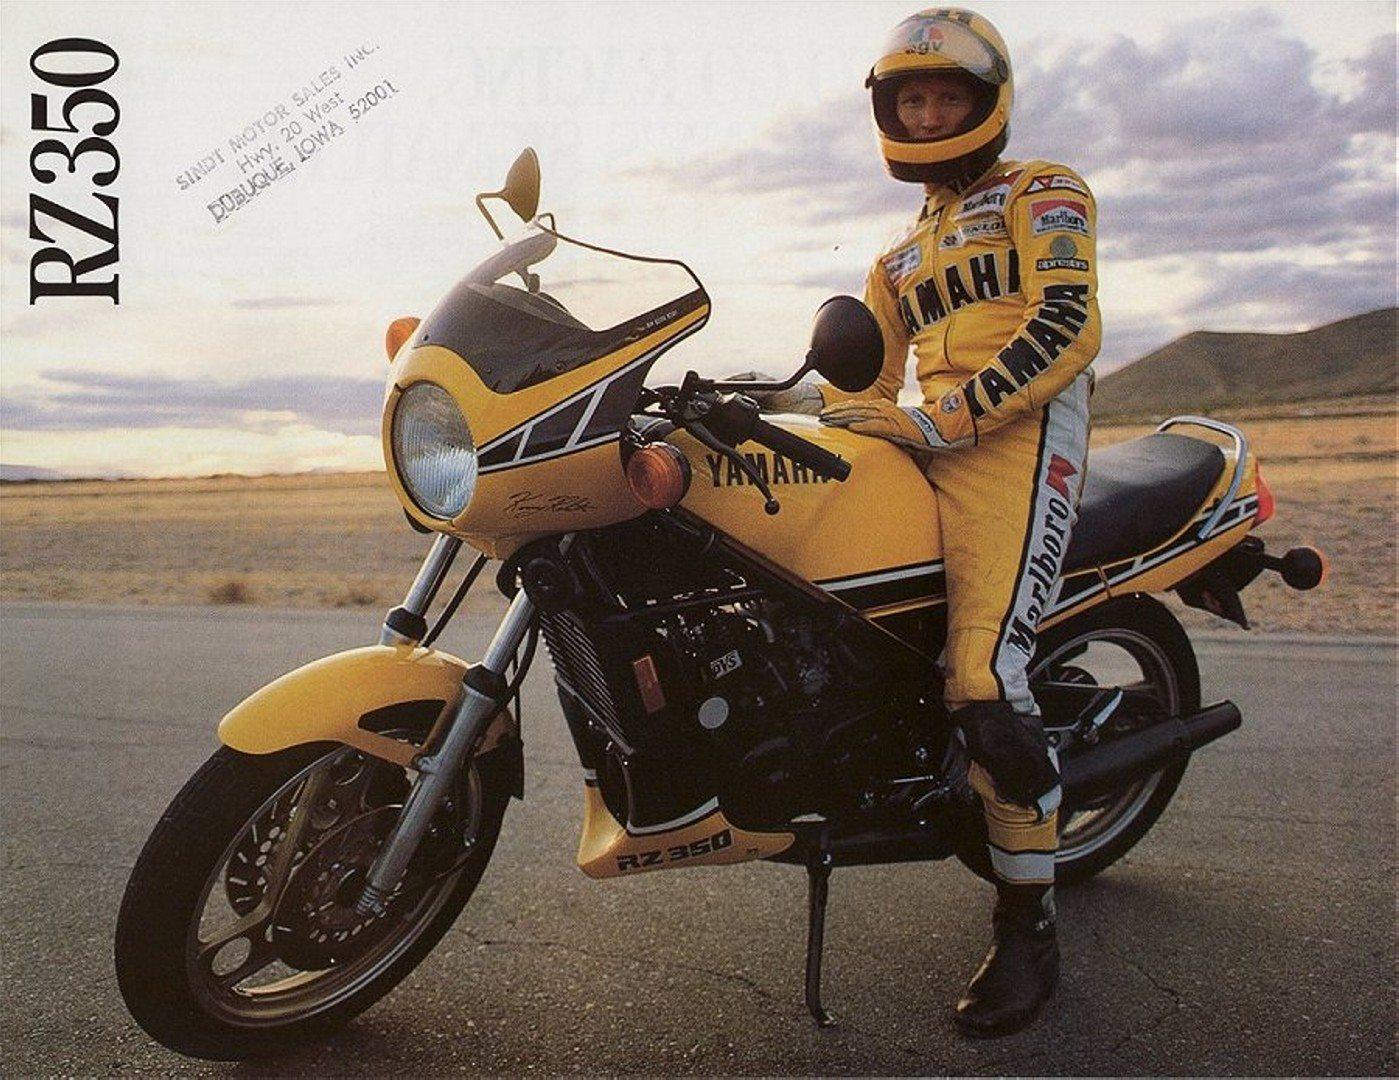 Yamha RZ 350 Kenny Roberts Edition (12)